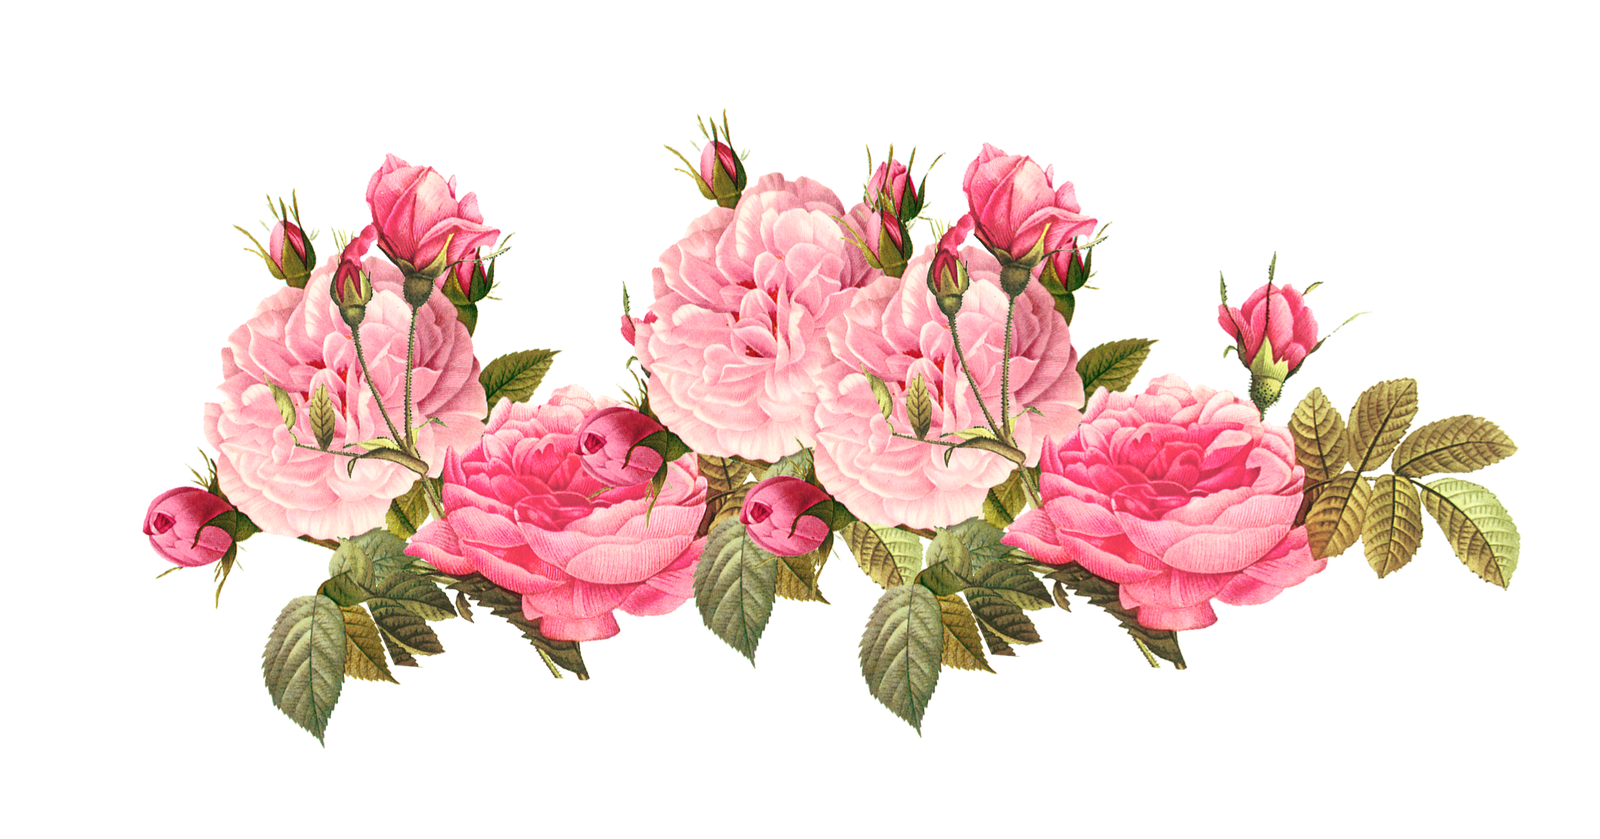 Vintage Rose Png Pink Roses Free Image